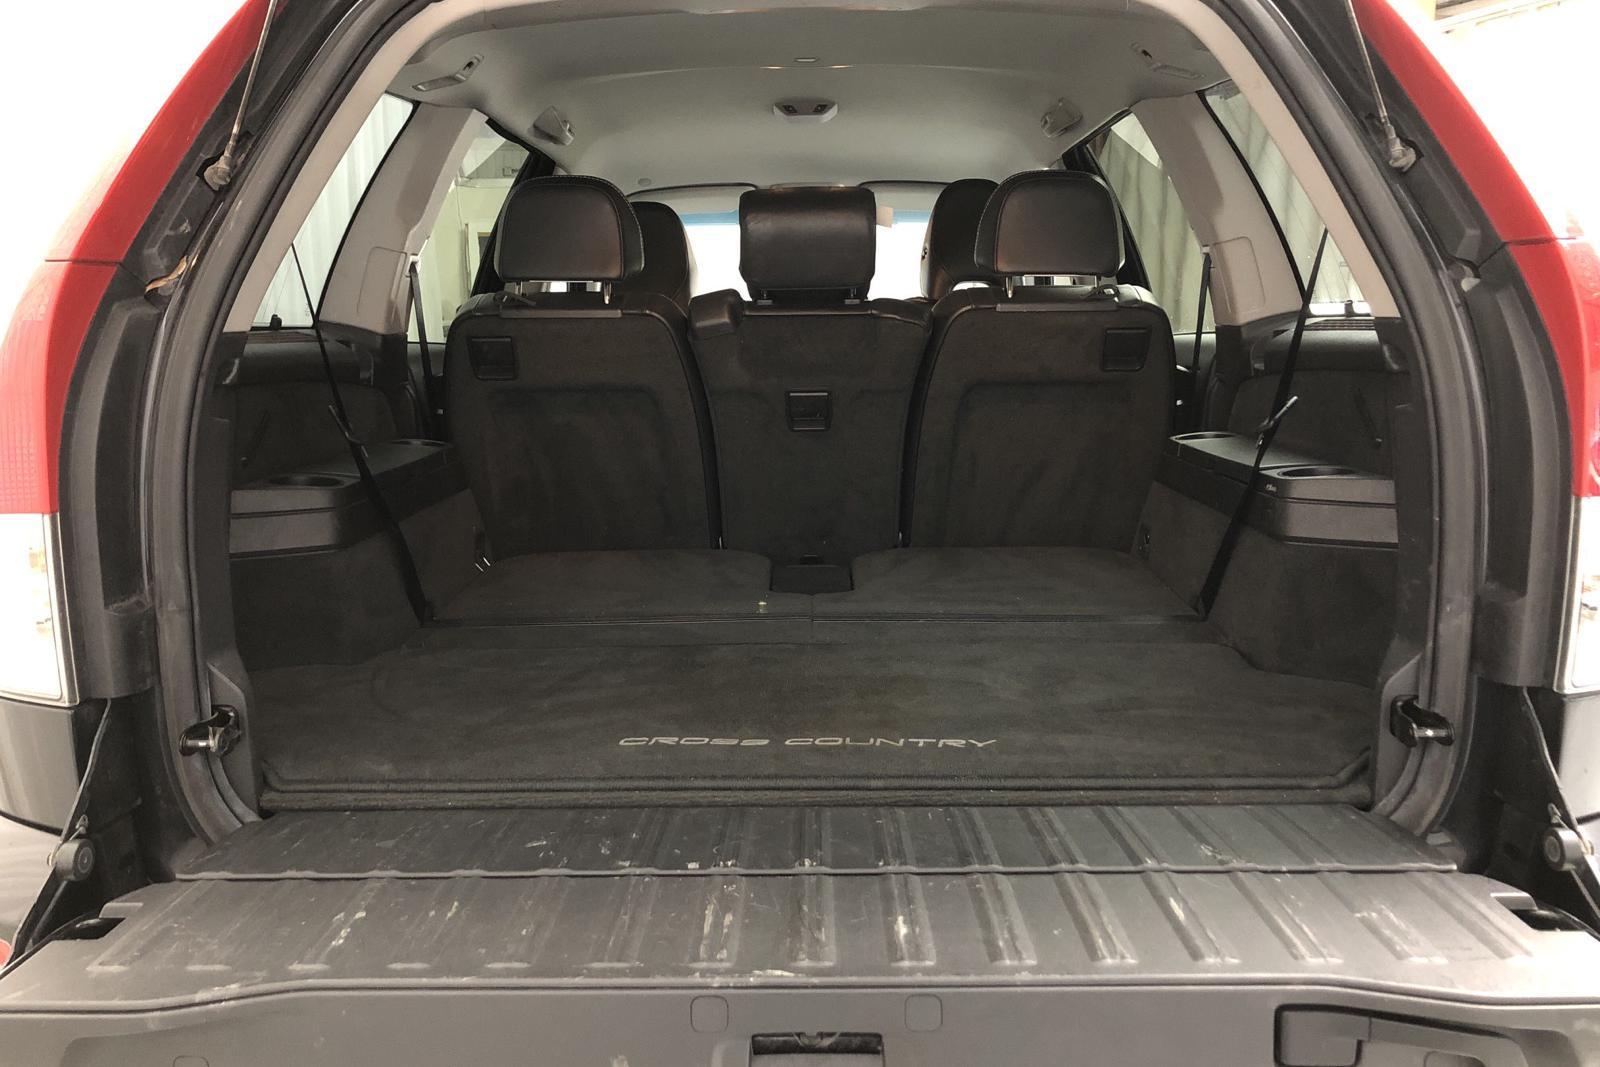 Volvo XC90 D5 AWD (200hk) - 172 620 km - Automatic - black - 2012